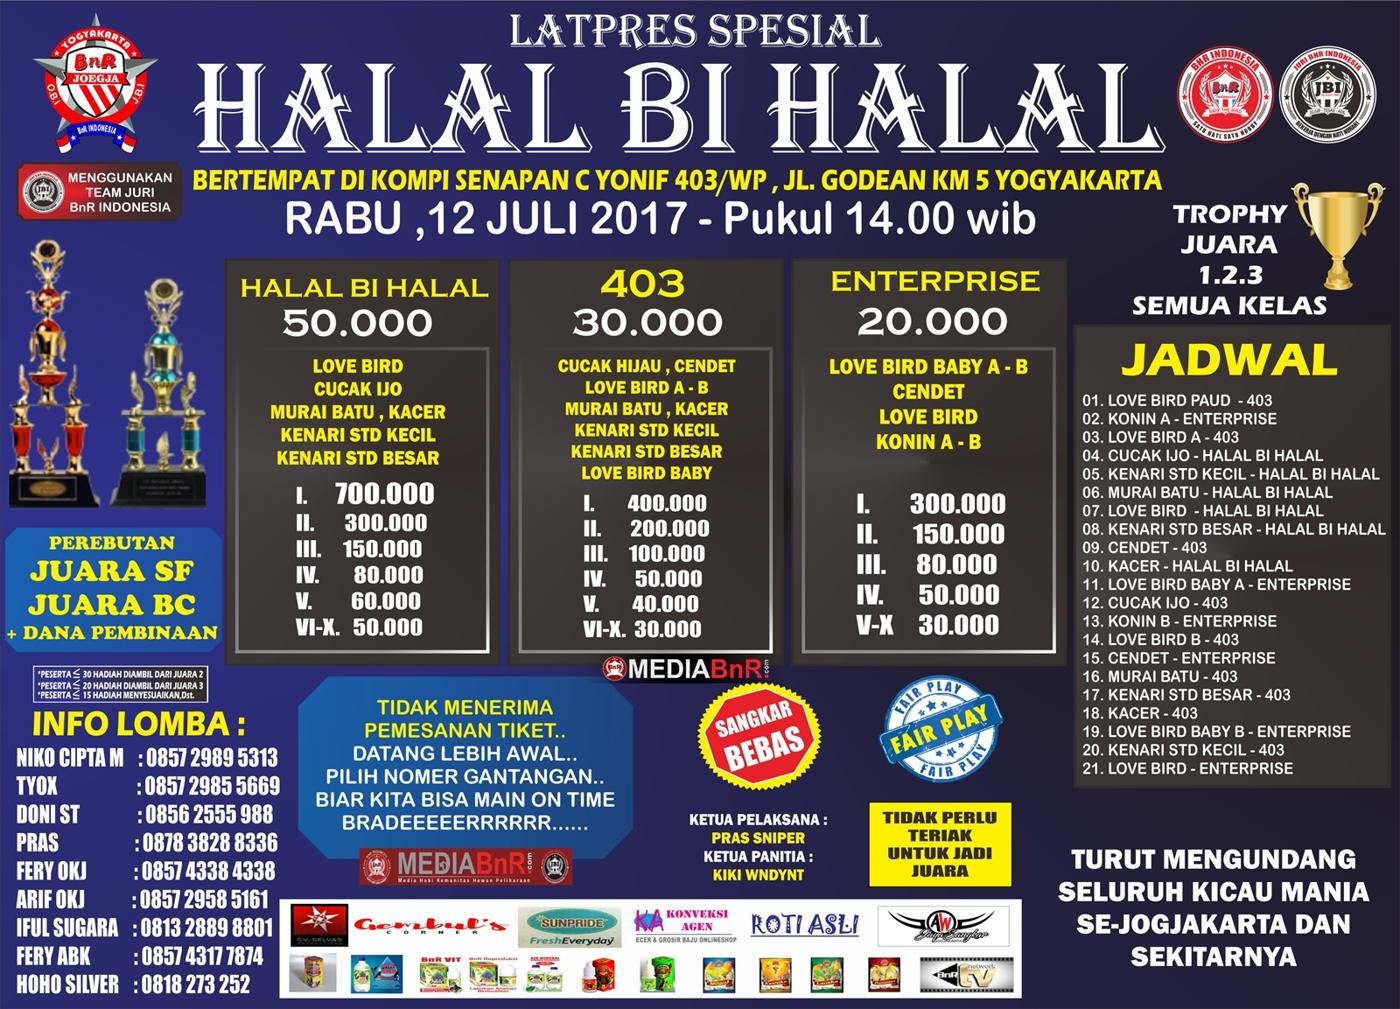 BROSUR LATPRES HALAL BI HALAL 403 enterprise bnr jogja